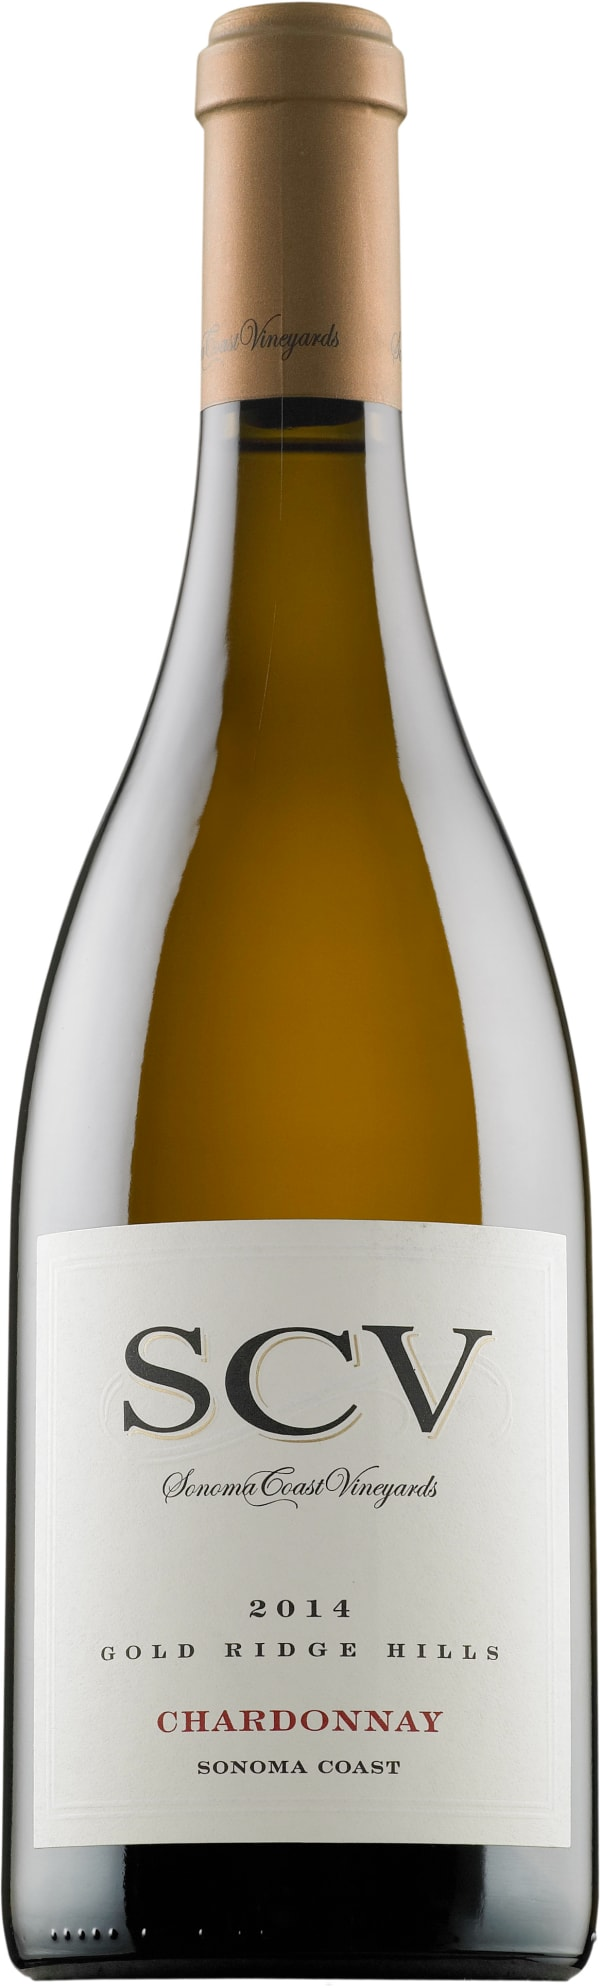 SCV Gold Ridge Hills Chardonnay 2014